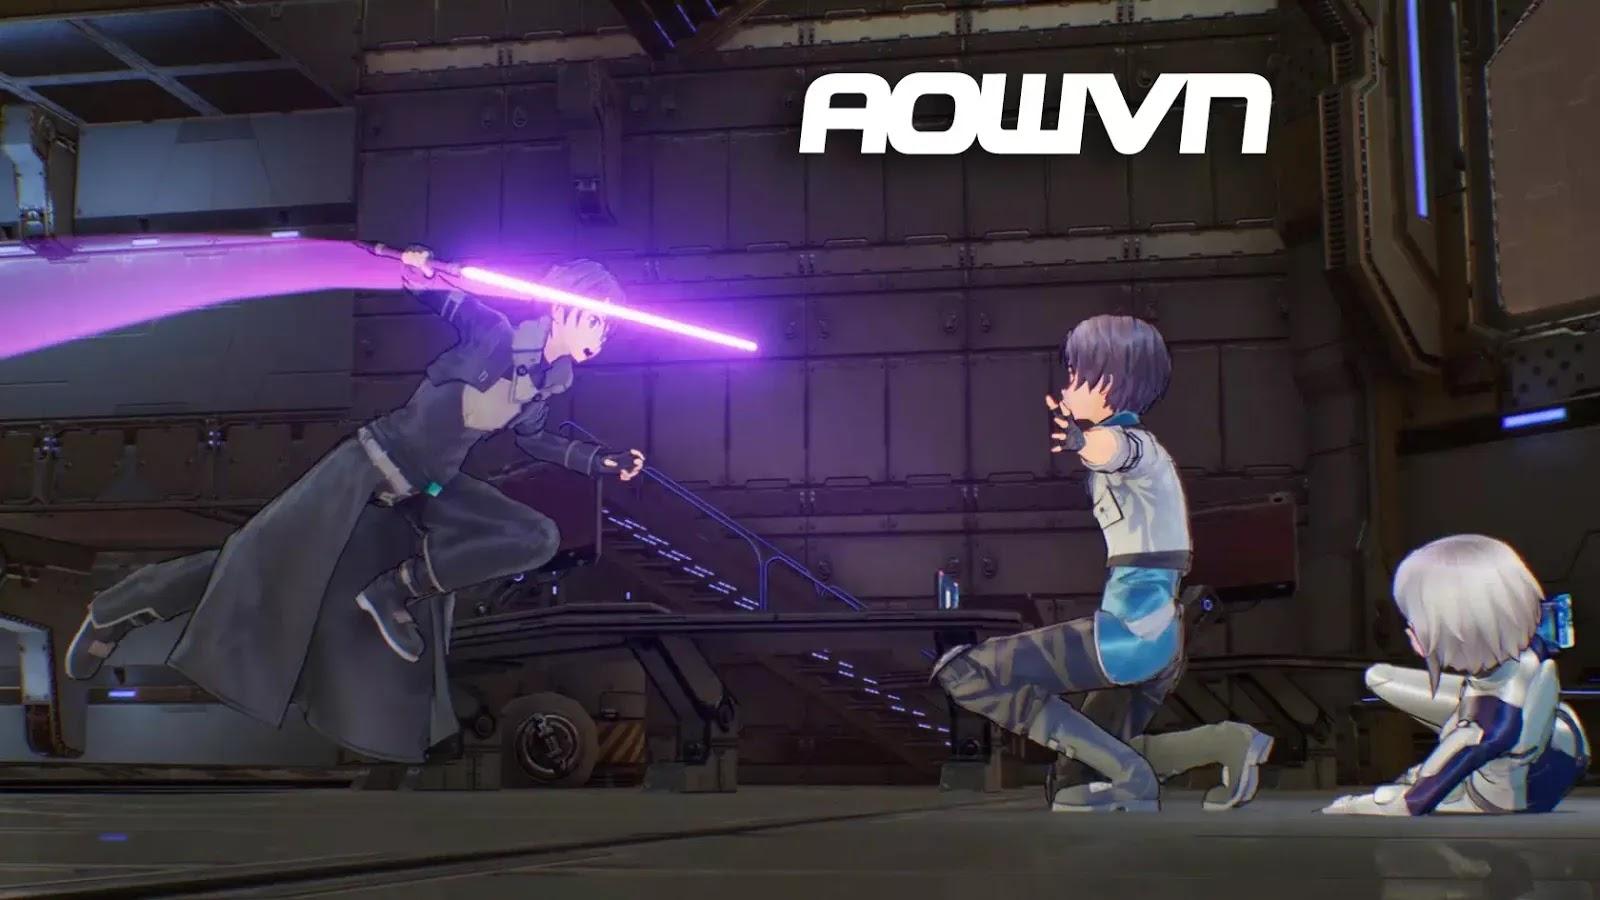 %255B%2BHOT%2B%255D%2BGame%2B%2BSword%2BArt%2BOnline%2BFatal%2BBullet%2B%2BPC%2B %2BGame%2BAnime%2BS%2B.A%2B.O%2B%25281%2529 - [ HOT ] Game : Sword Art Online: Fatal Bullet | PC - Game Anime S .A .O